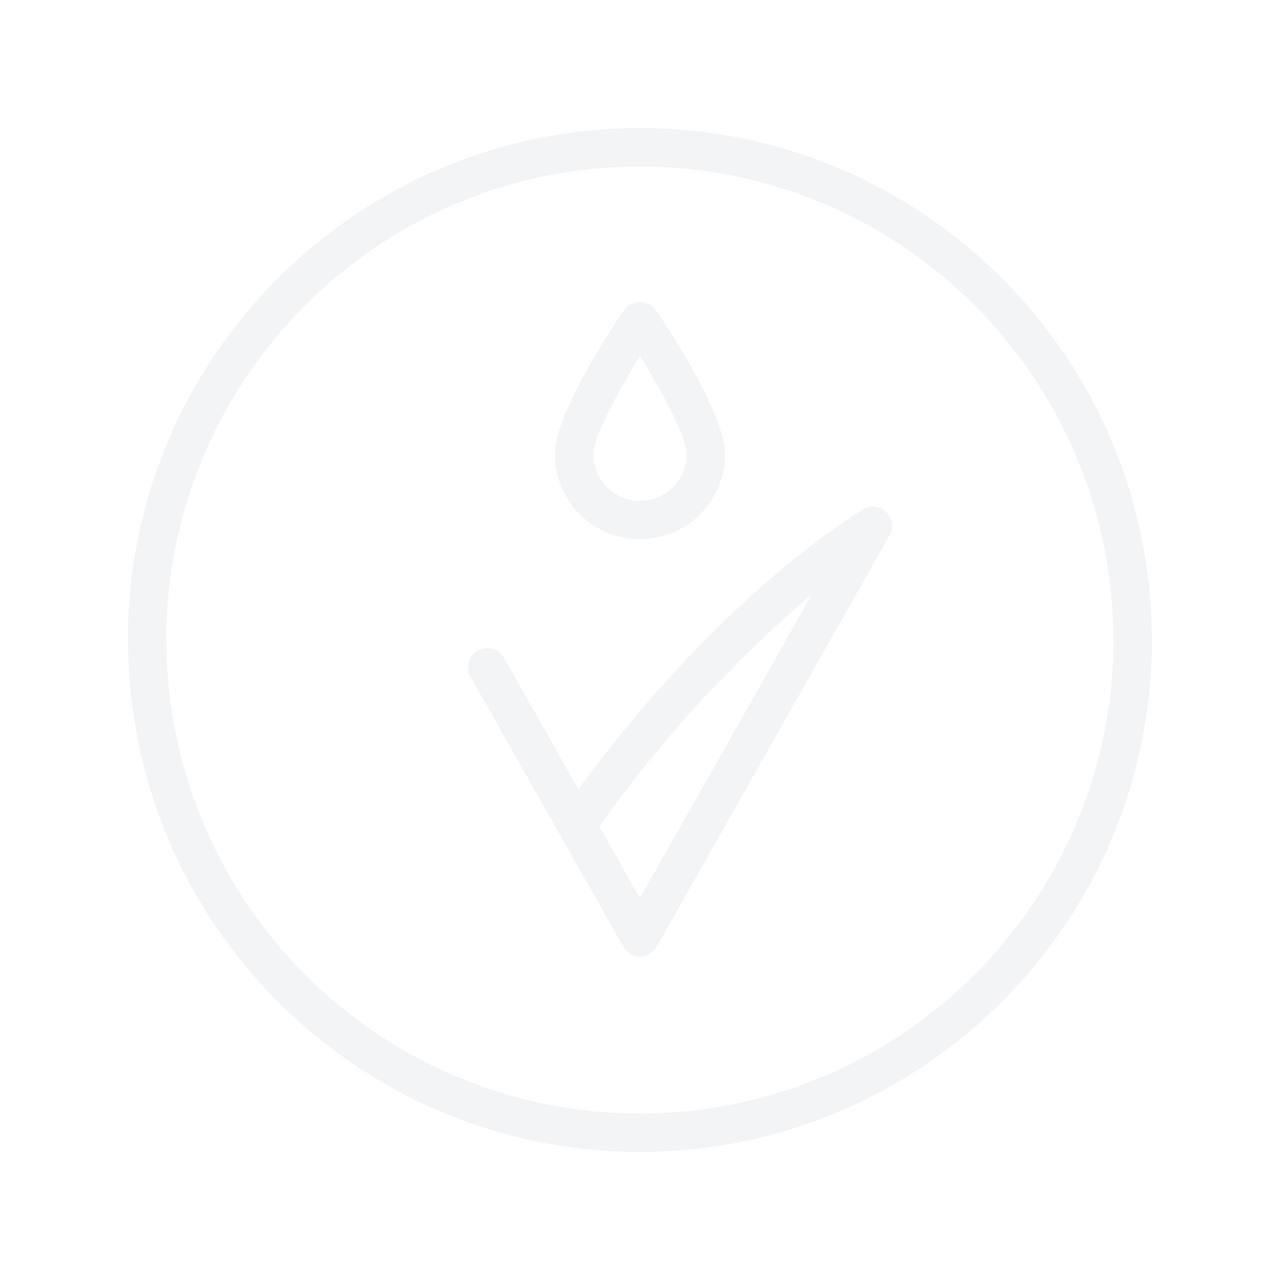 L'OREAL Color Riche X Balmain Collection Lipstick 4.2g